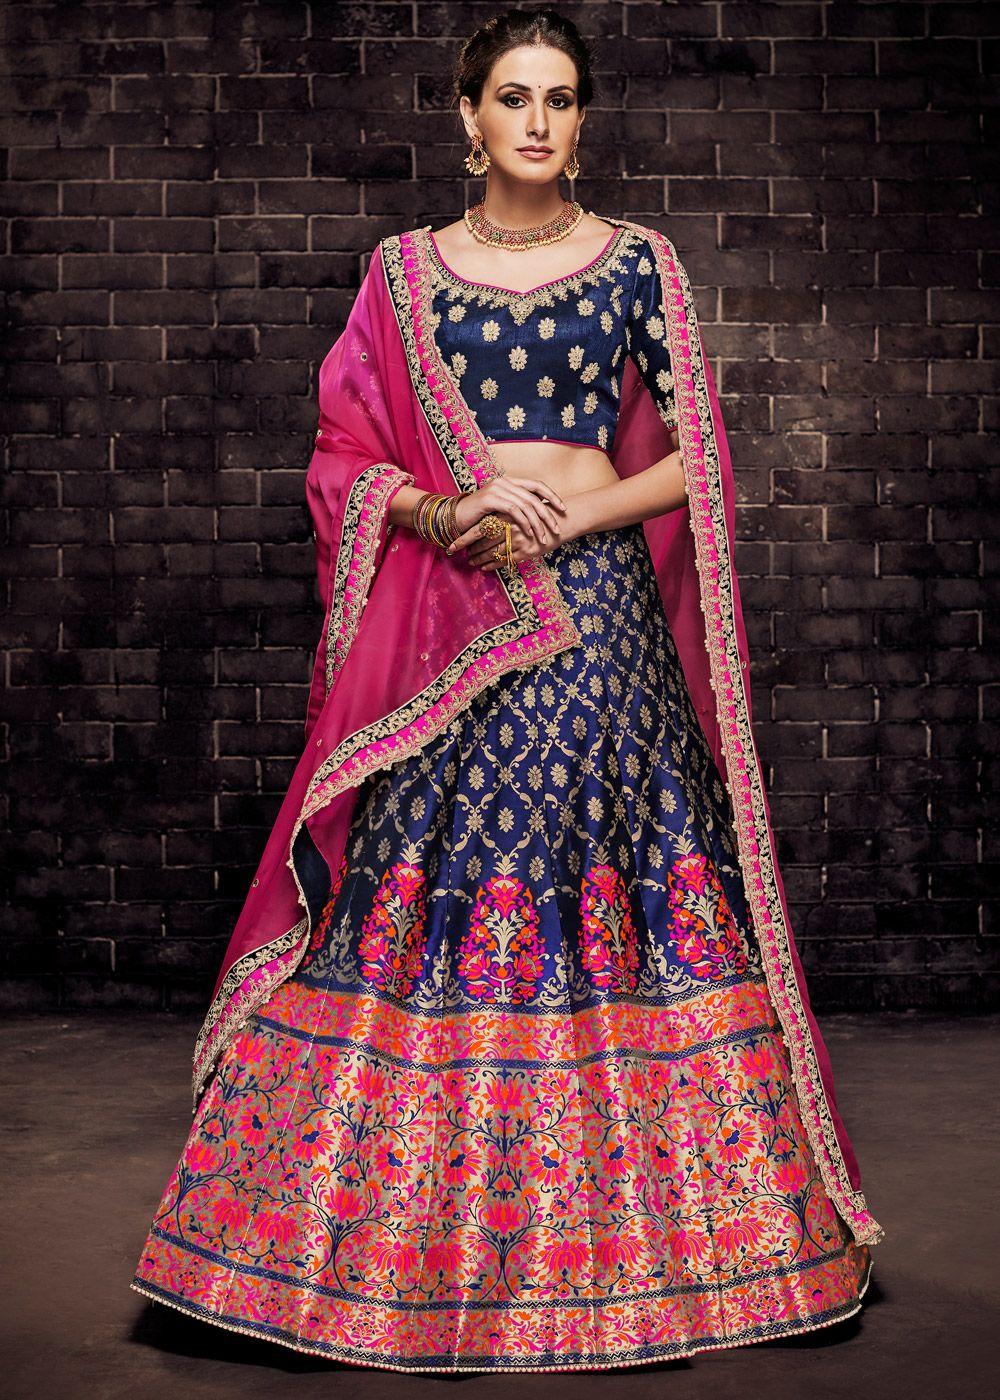 93e5c9a93d #Lehenga #BridalLehenga #ReceptionLehenga #WeddingLehenga  #IndianWeddingDresses #IndianBridalWear #IndianDresses #IndianEthnicWear # LehengaCholi ...